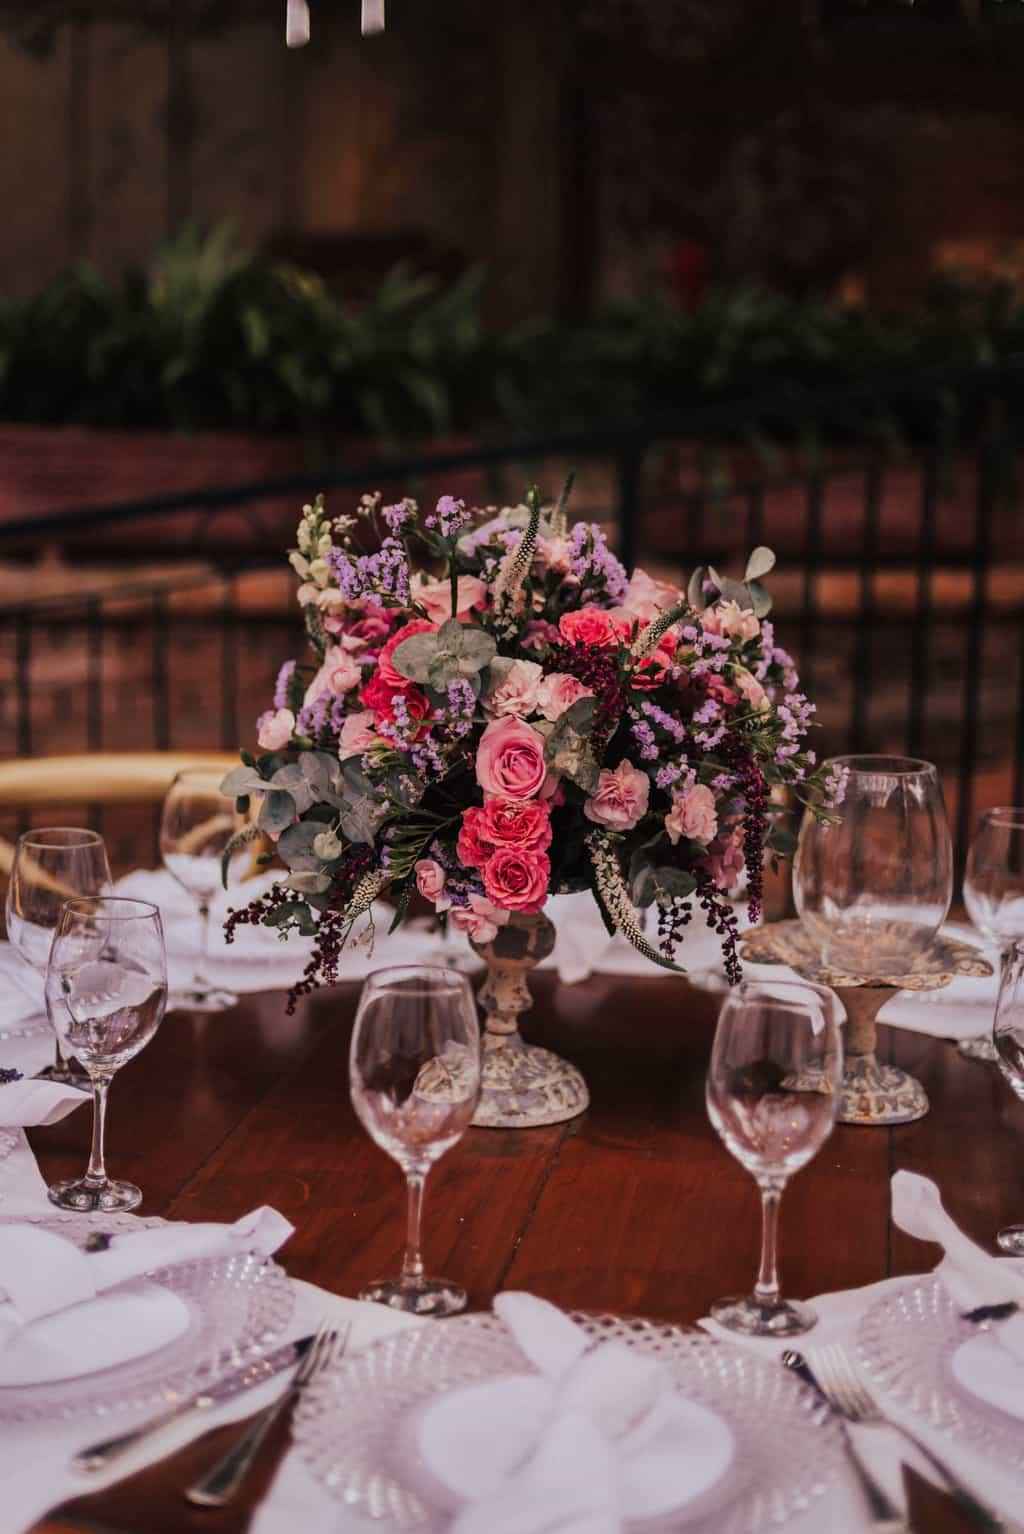 Boutique-de-Cena-casamento-Rebeca-e-Eldrey-Fazenda-Vila-Rica-Fotografia-Mana-Gollo-mesa-dos-convidados-Toda-de-Branco17